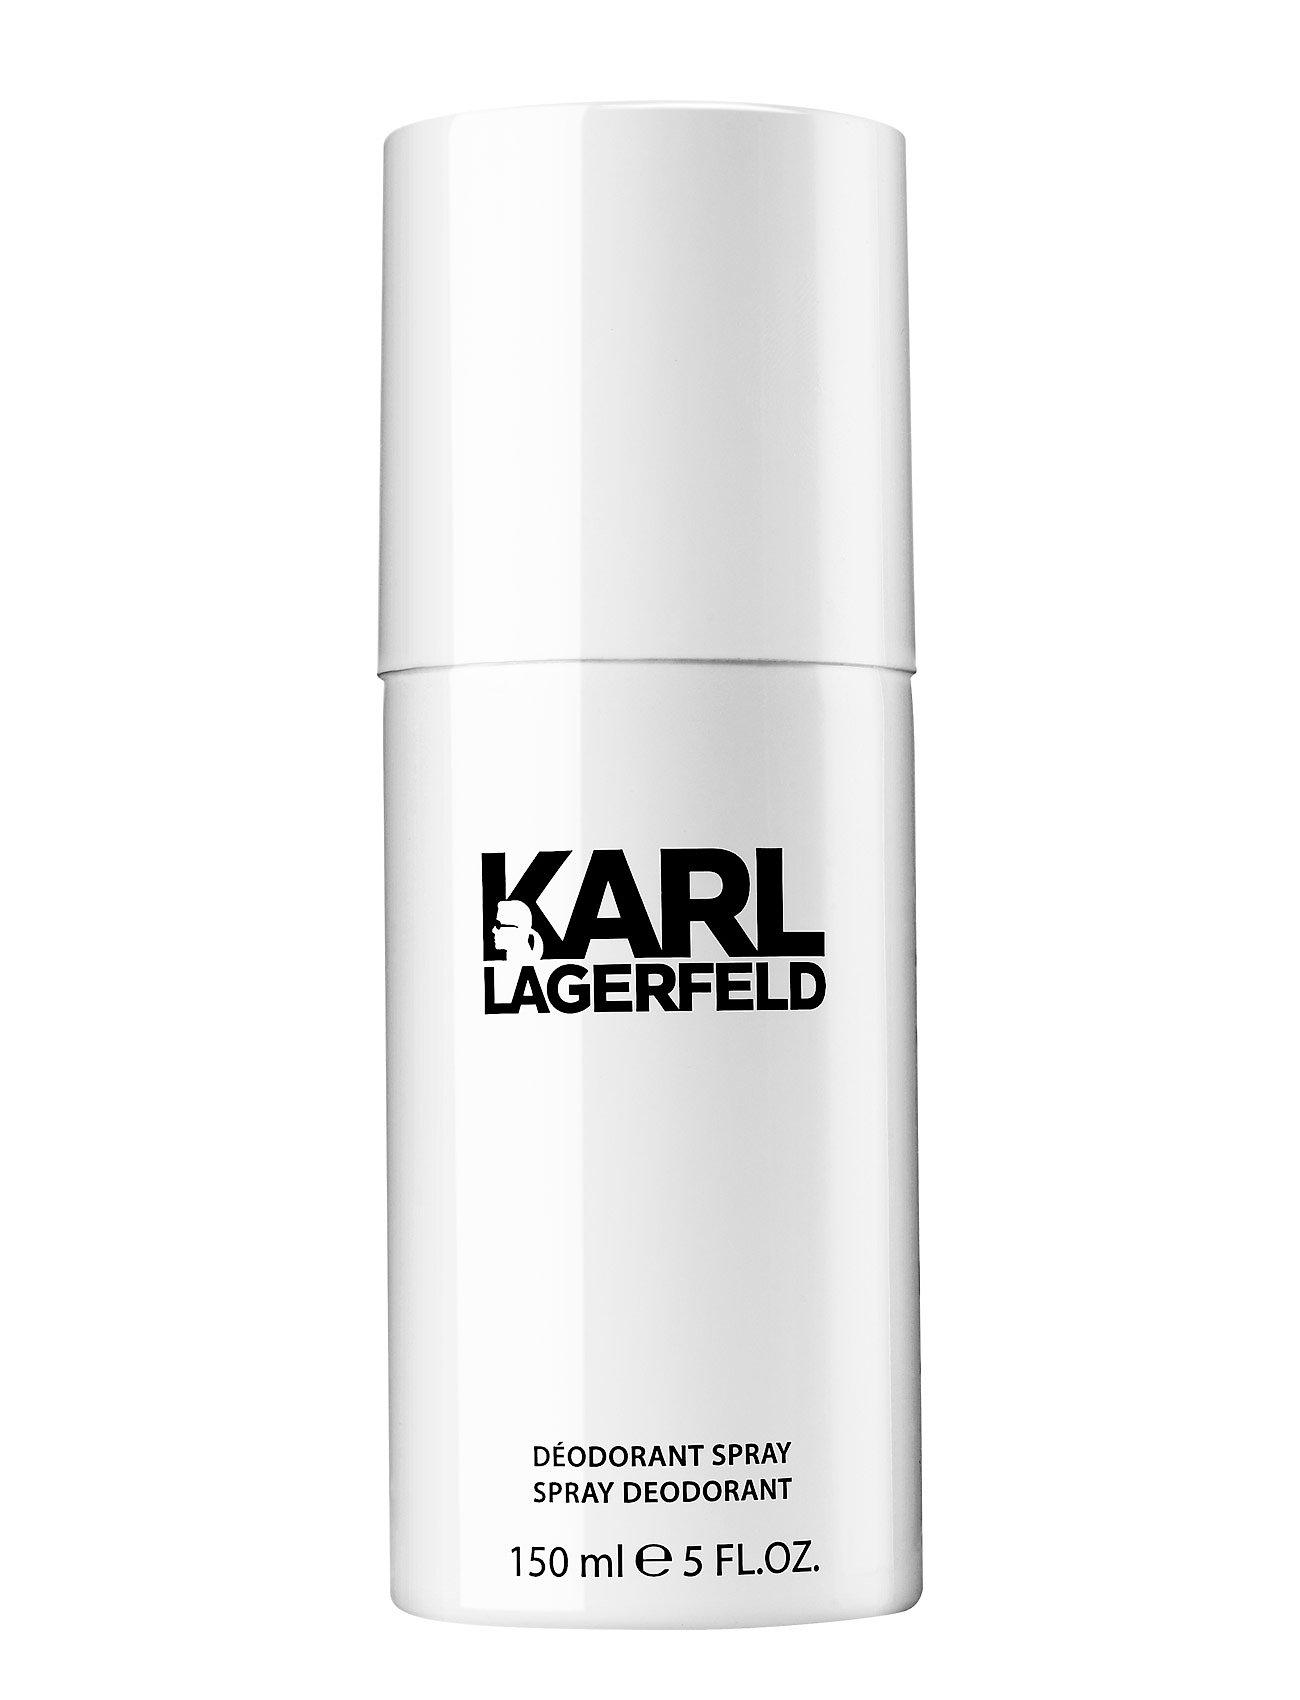 Image of Women Deodorant Spray Beauty WOMEN Deodorants Spray Nude Karl Lagerfeld Fragrance (3421794283)